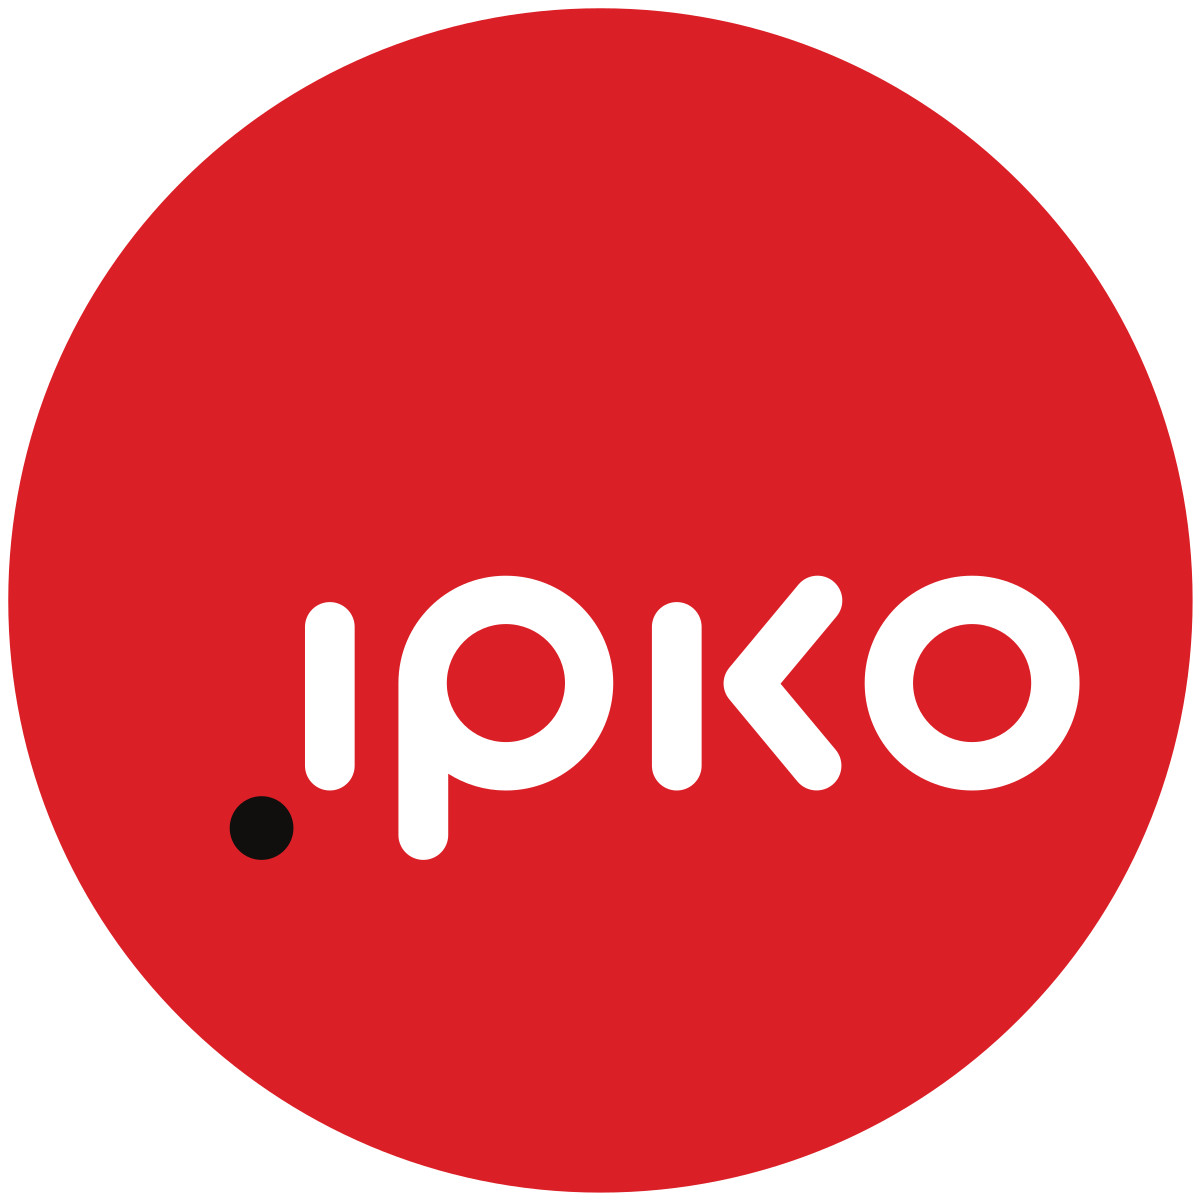 IPKO Telecommunications L.L.C